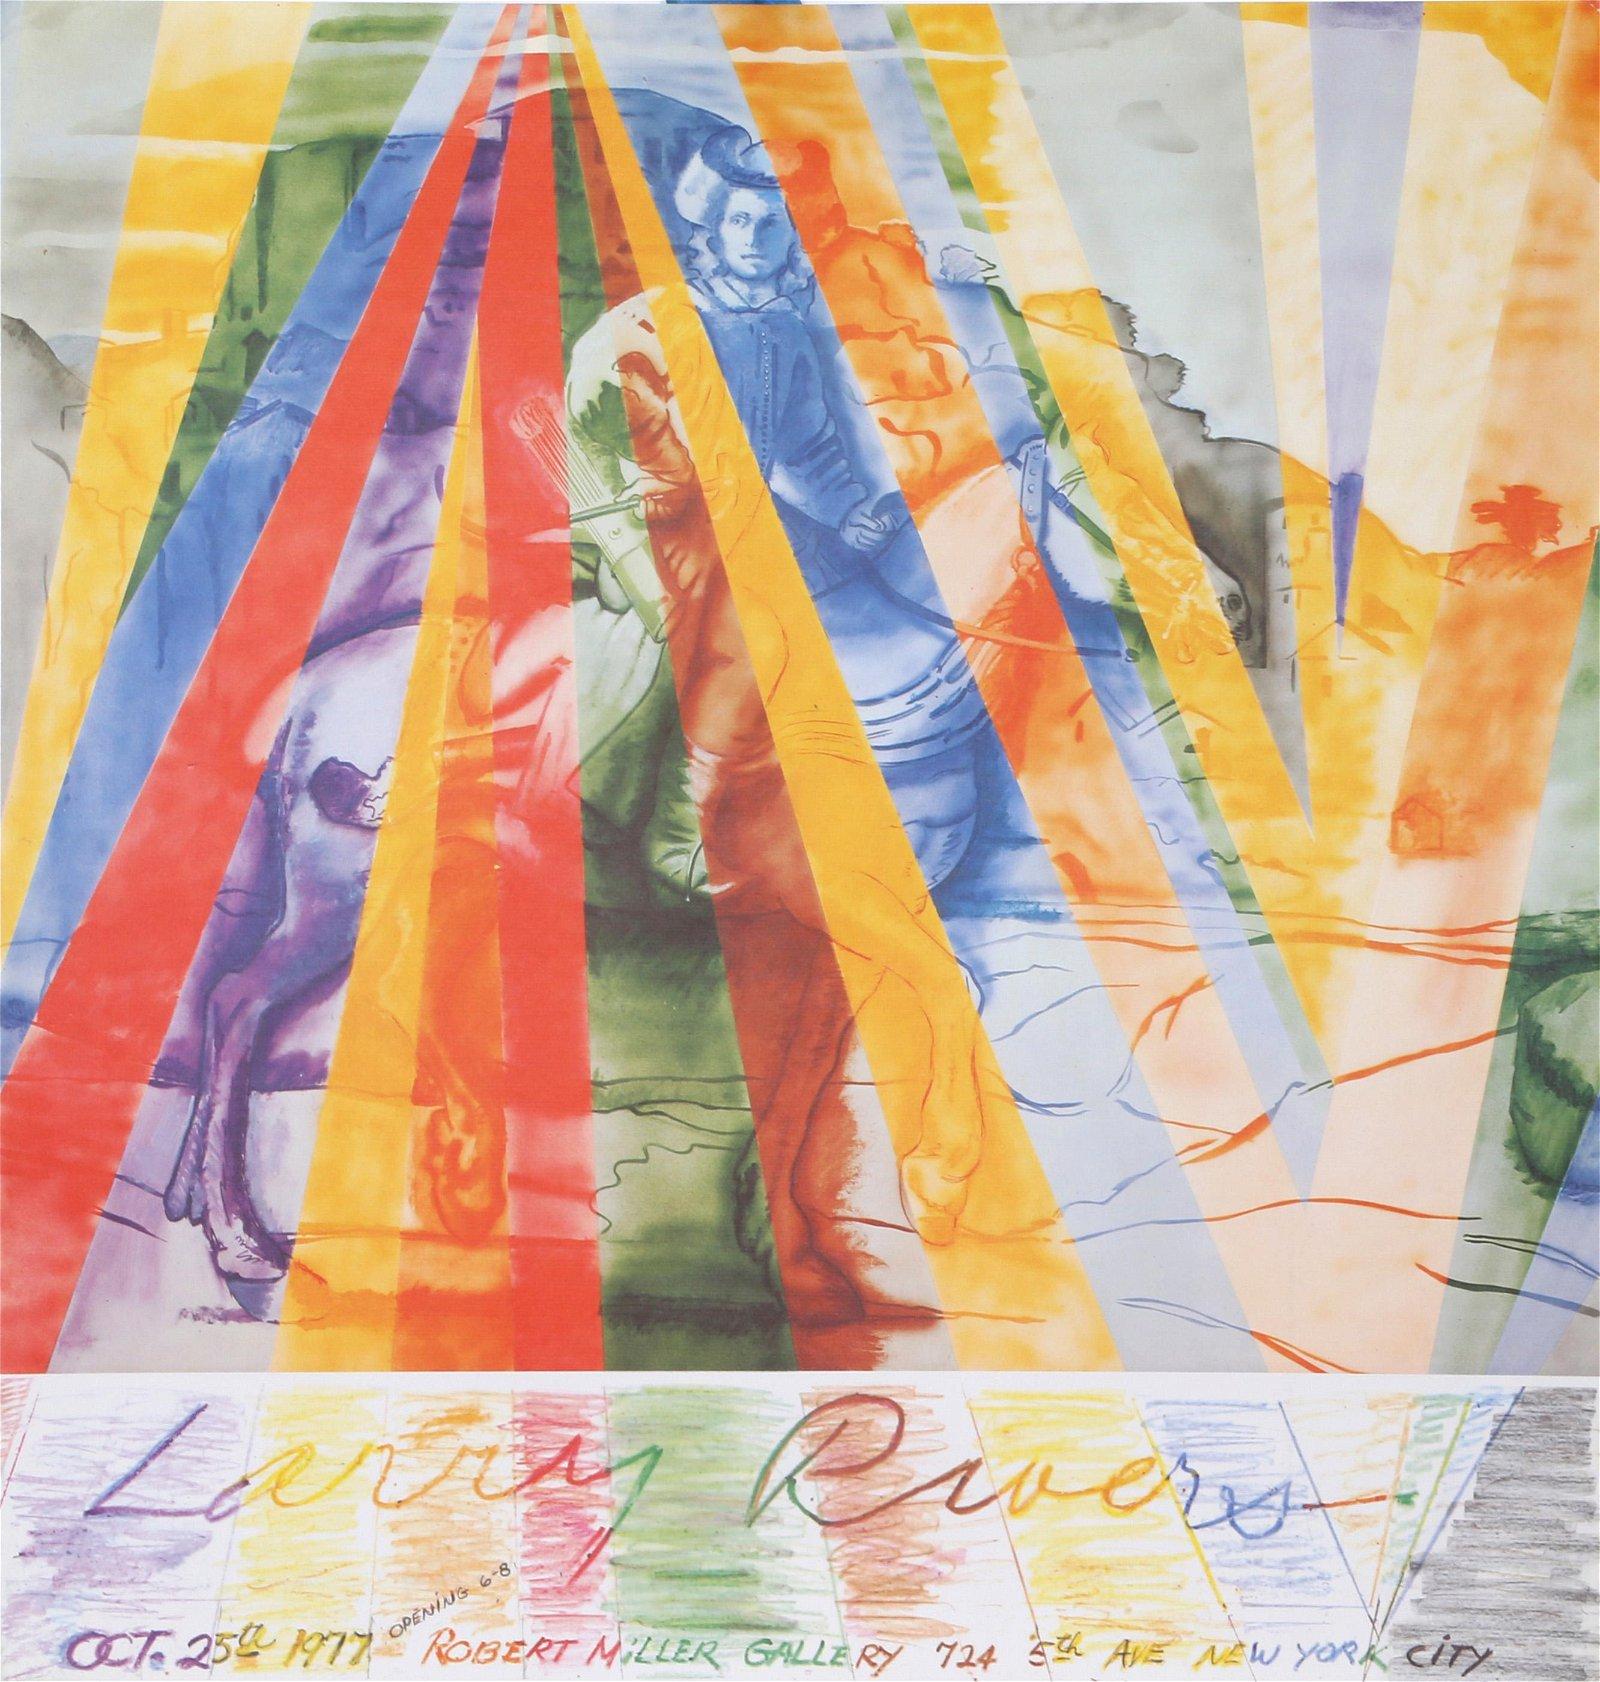 Larry Rivers, Robert Miller Gallery Exhibition, Poster